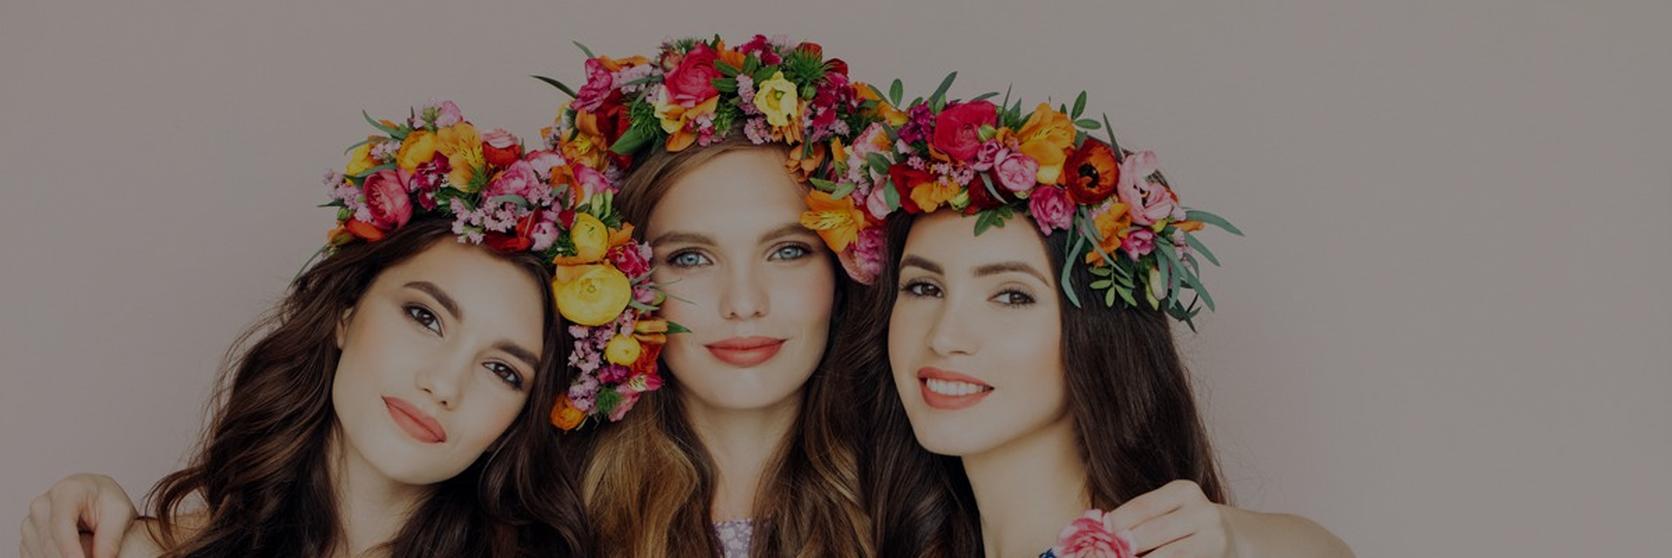 Hen-party-flower-crowns